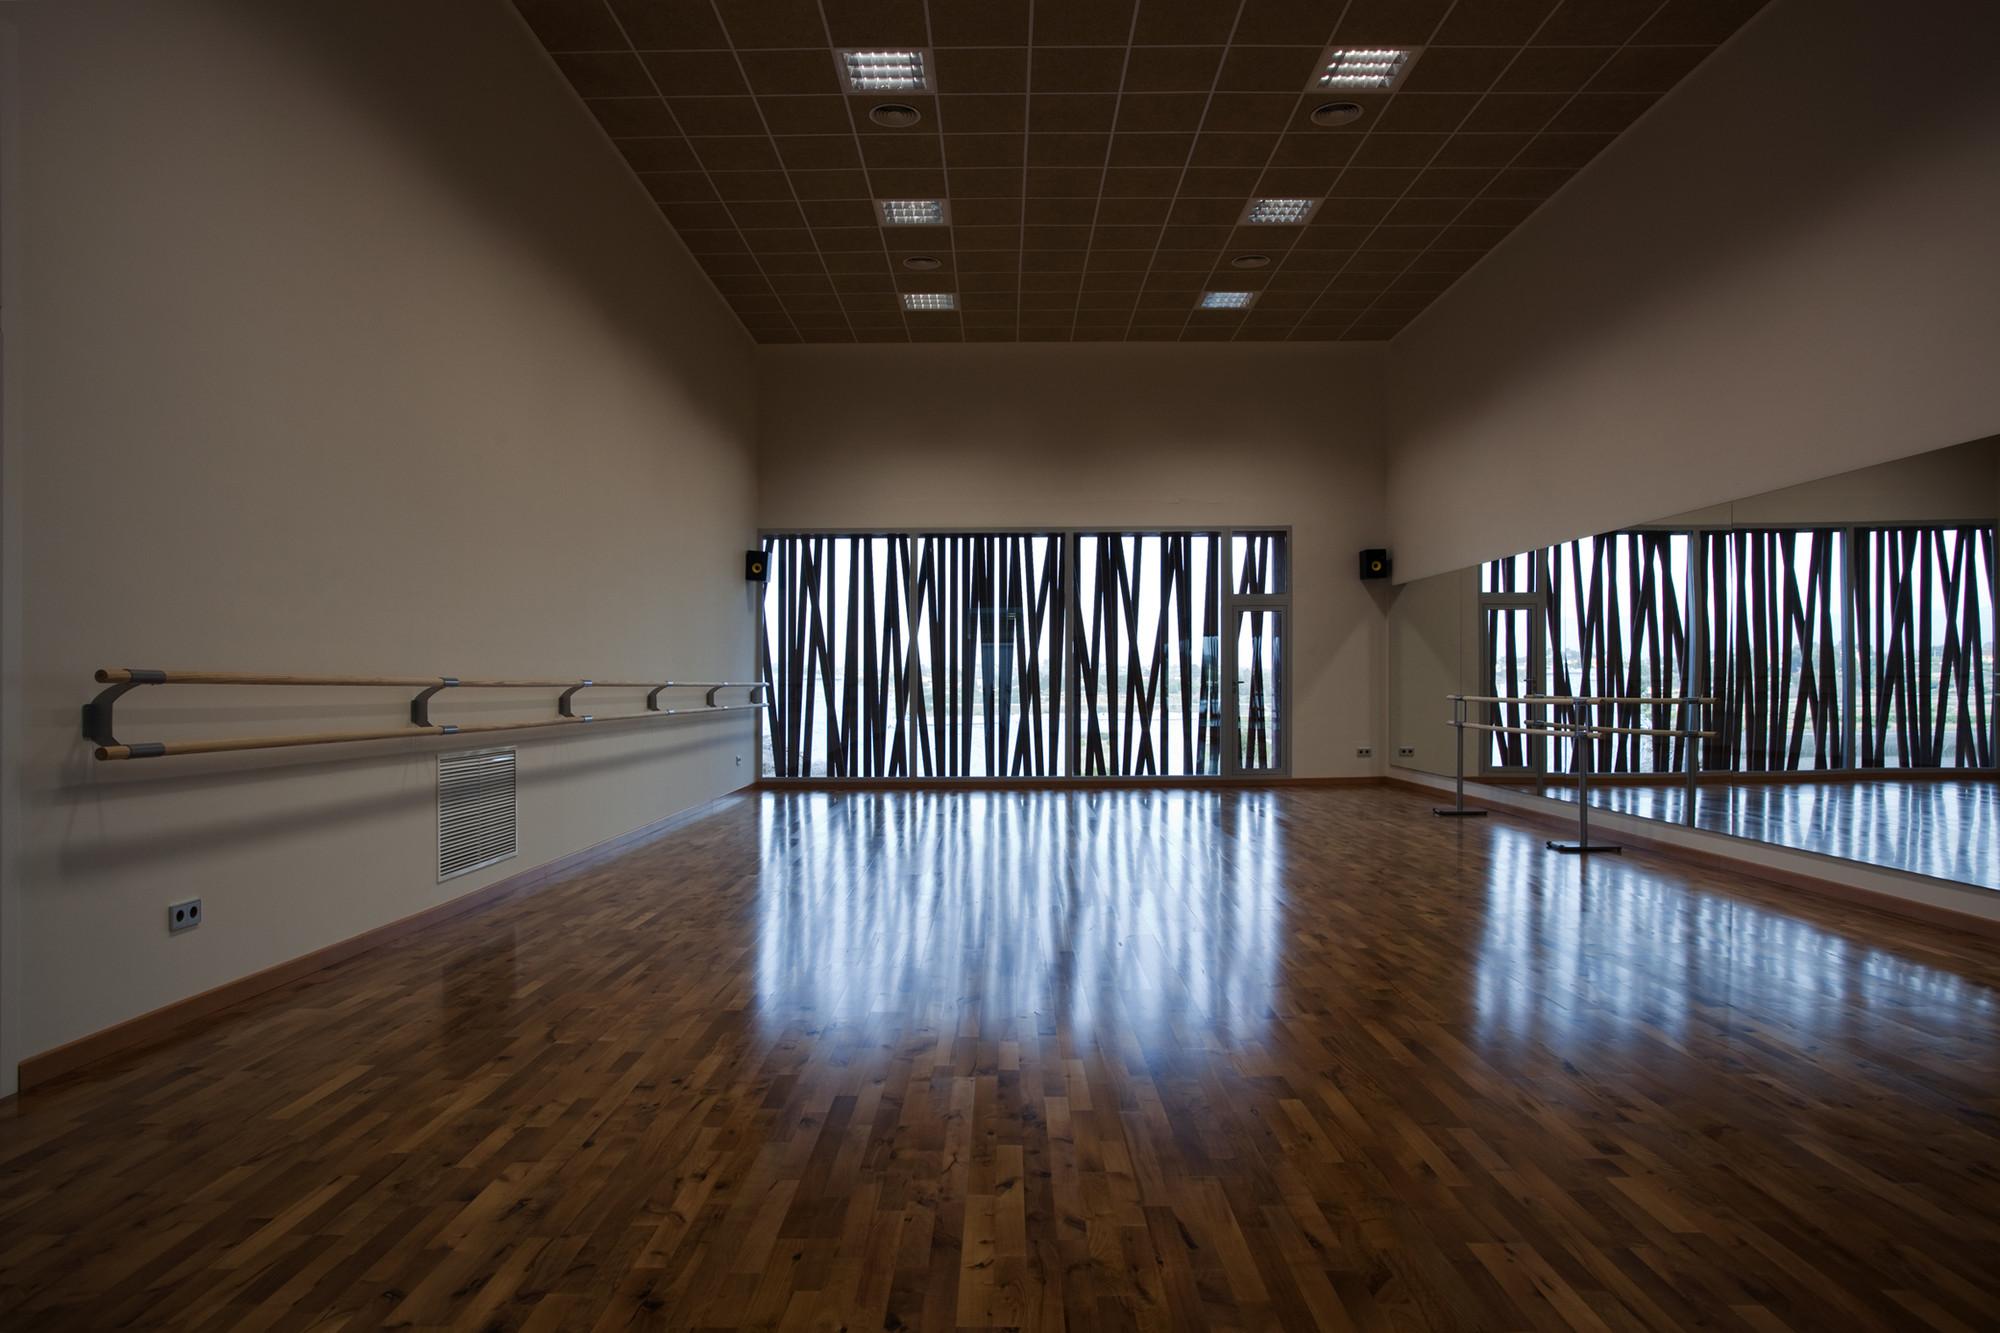 dancing classroom interior decoration - photo #32